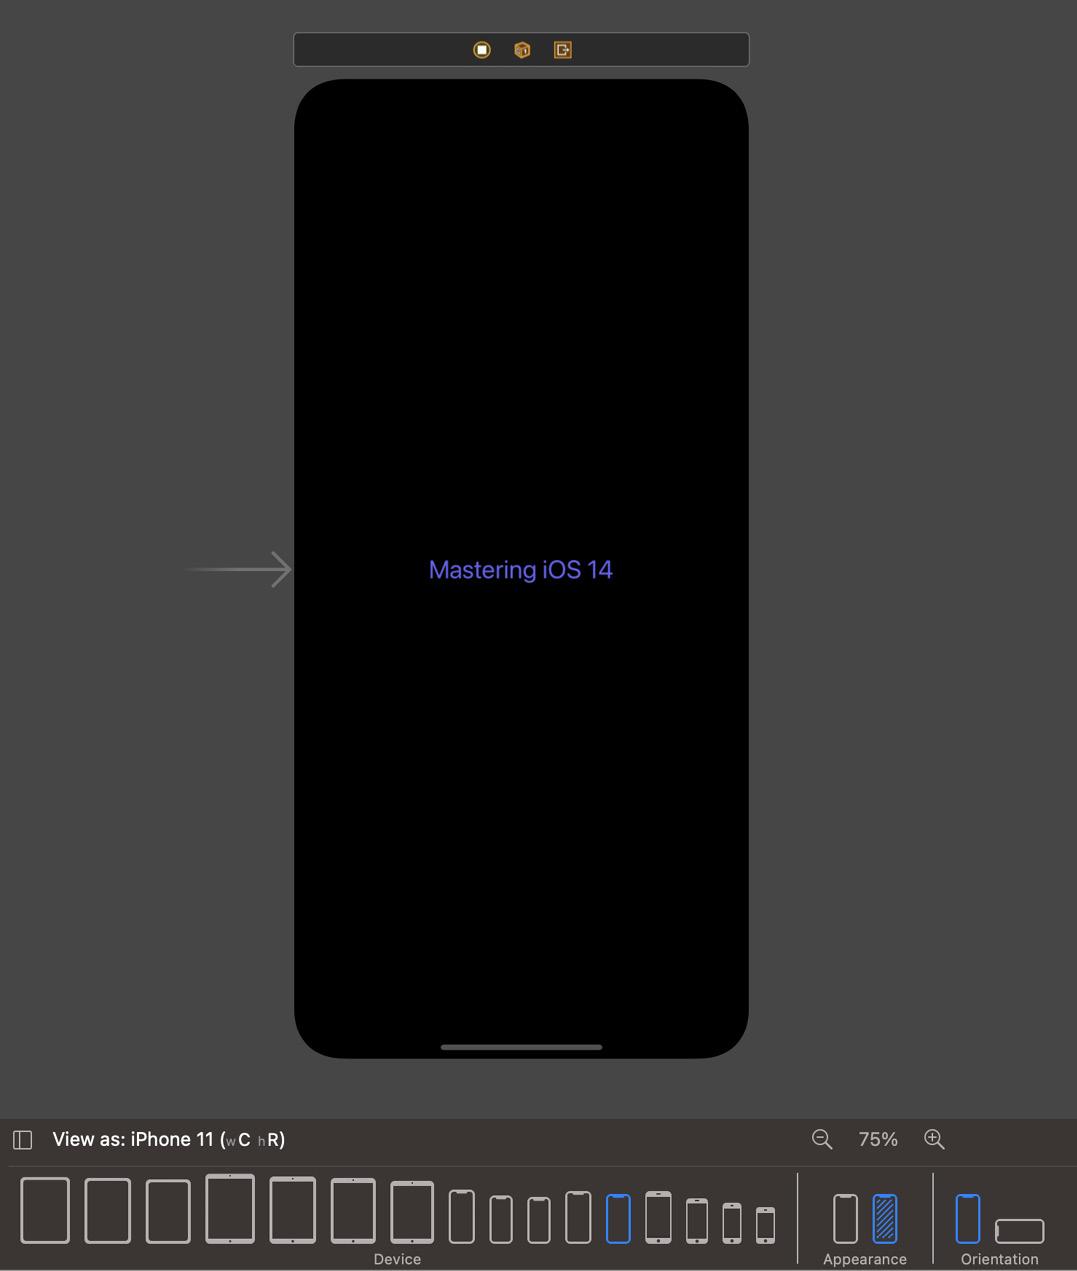 Figure 2.12 – Dark mode with indigo text color